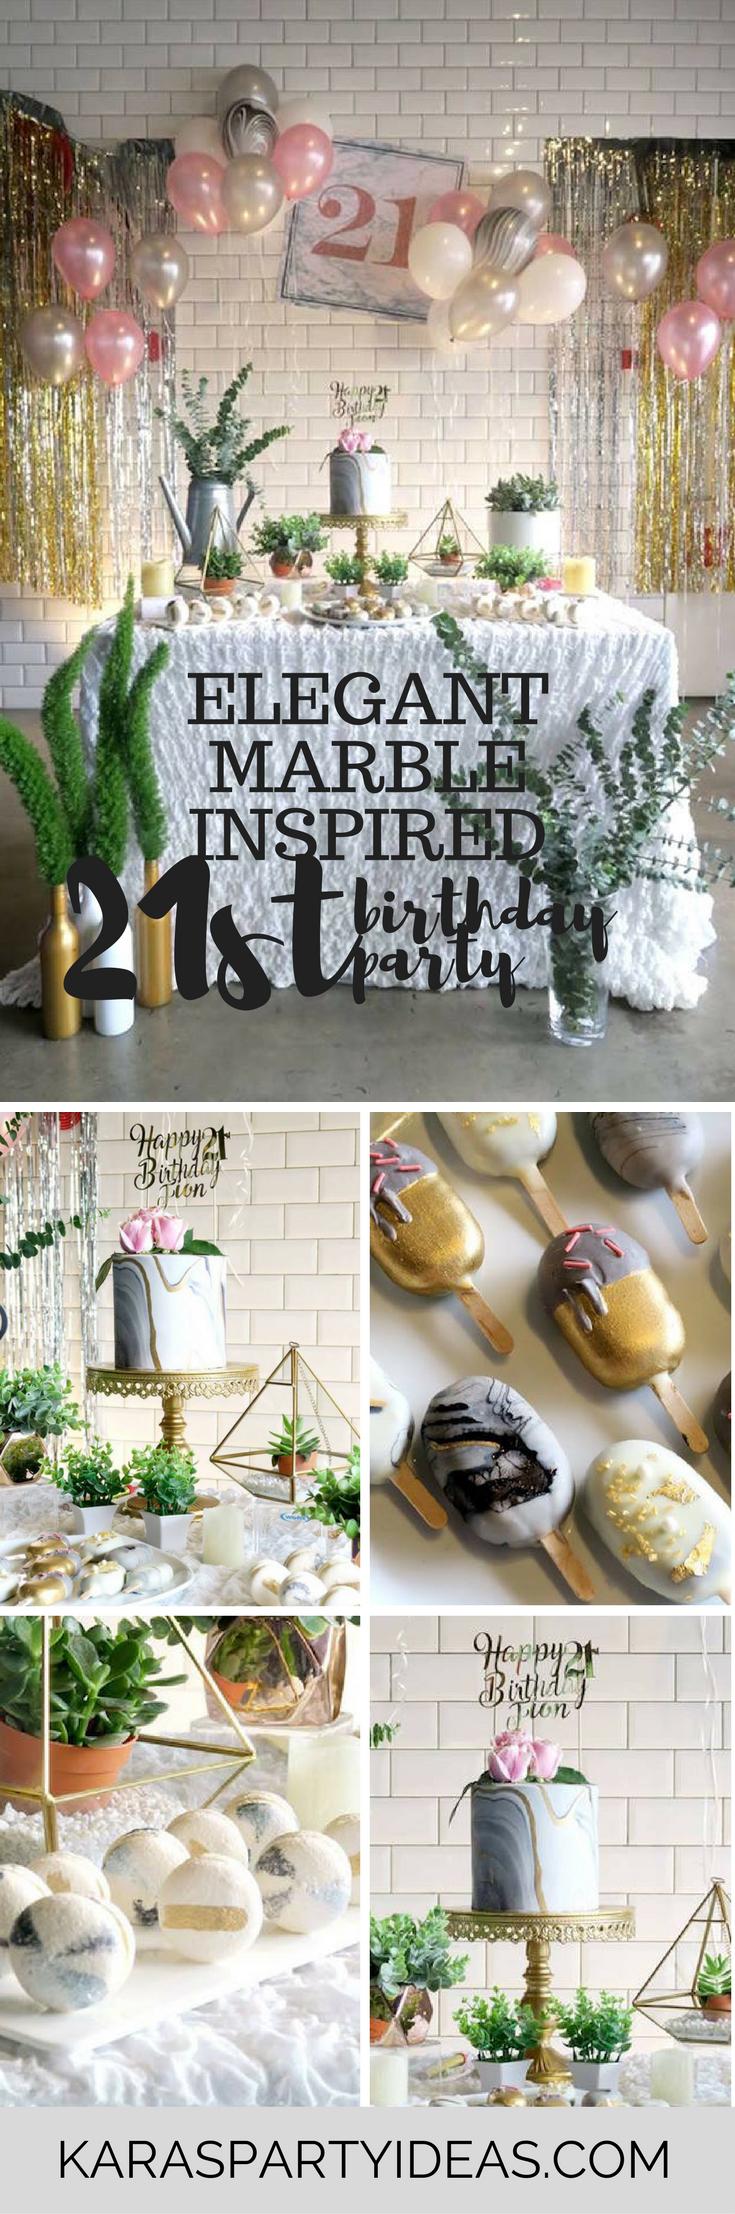 Elegant Marble Inspired 21st Birthday Party via Kara's Party Ideas - KarasPartyIdeas.com